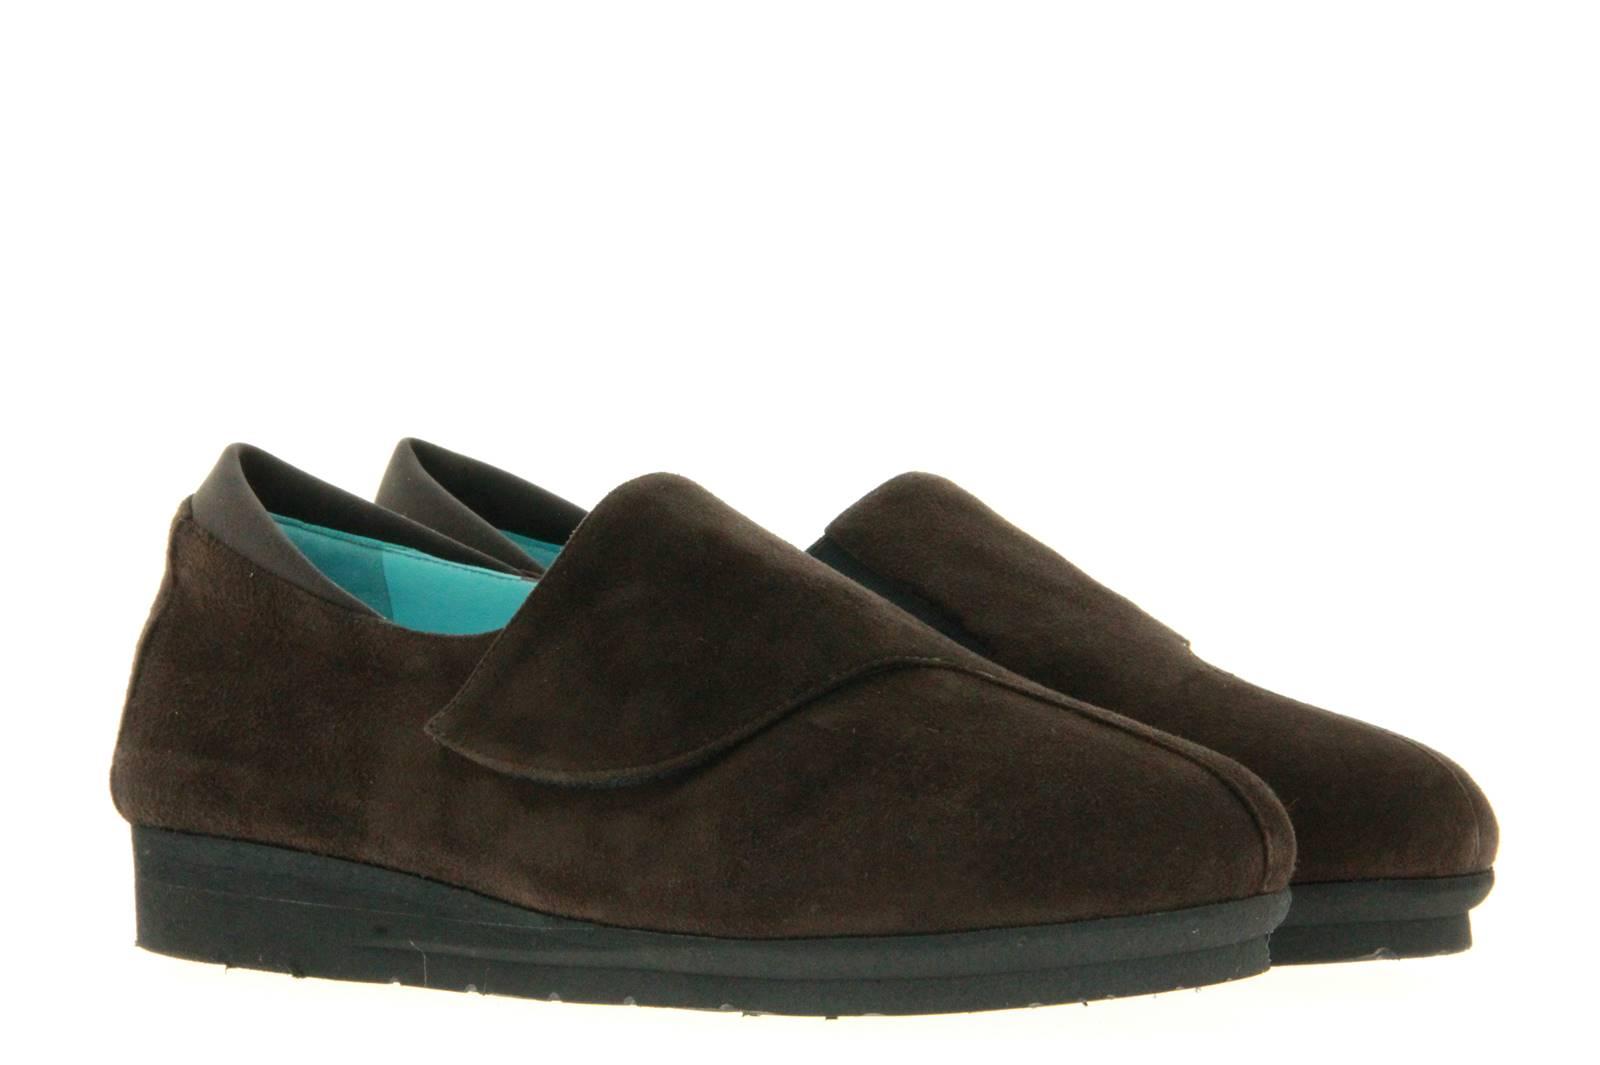 Thierry Rabotin Velcro shoe GRANIA CAMOSCIO T.D.MORO